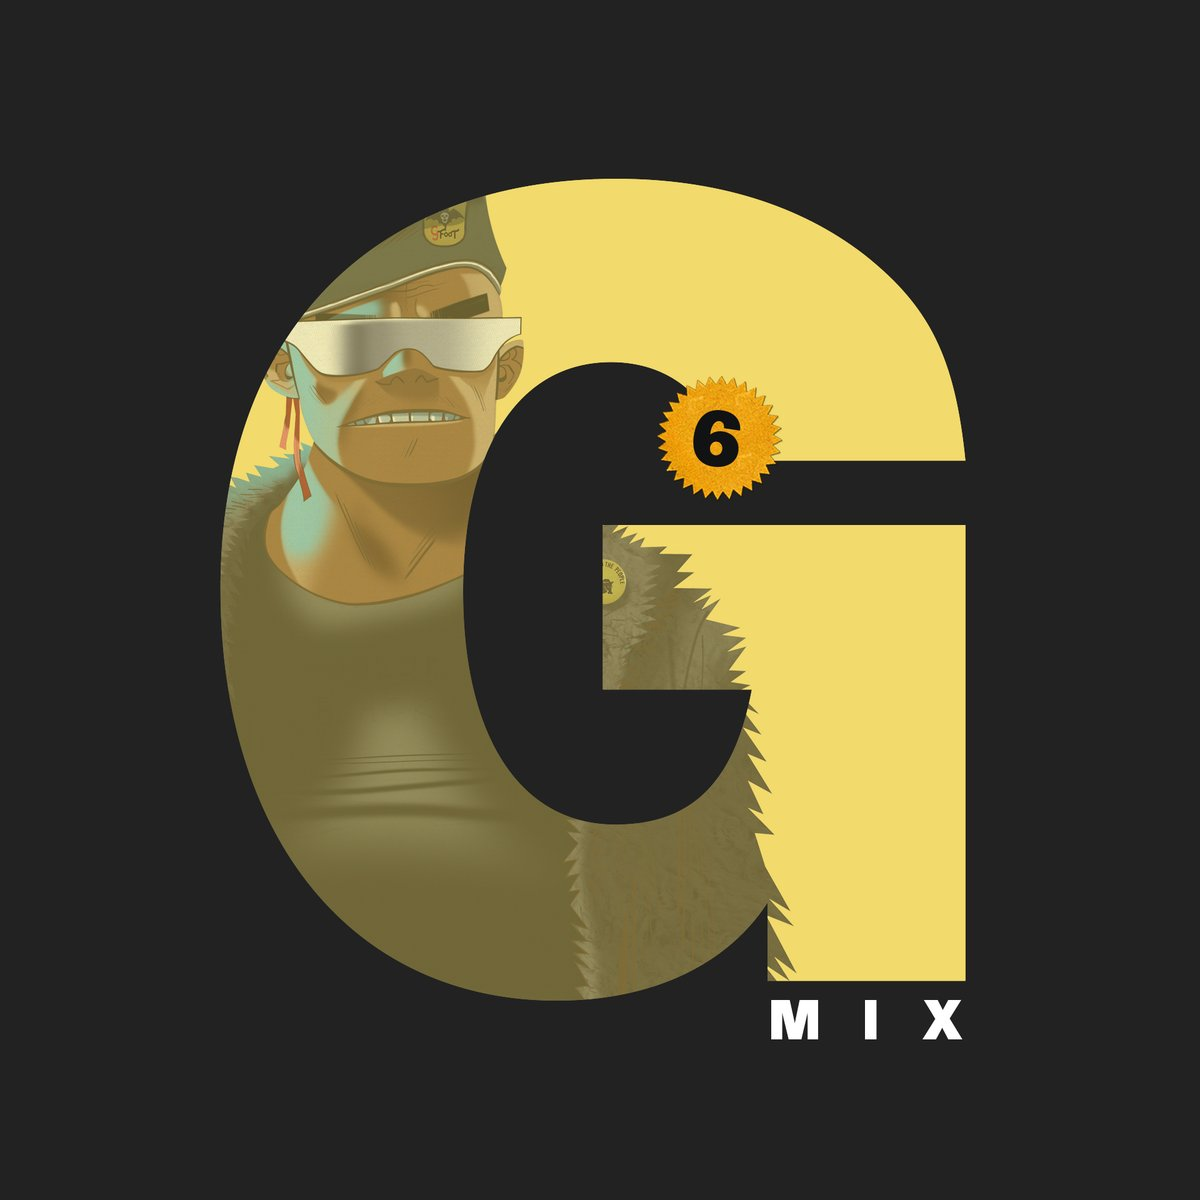 G-Mix: Russel 6